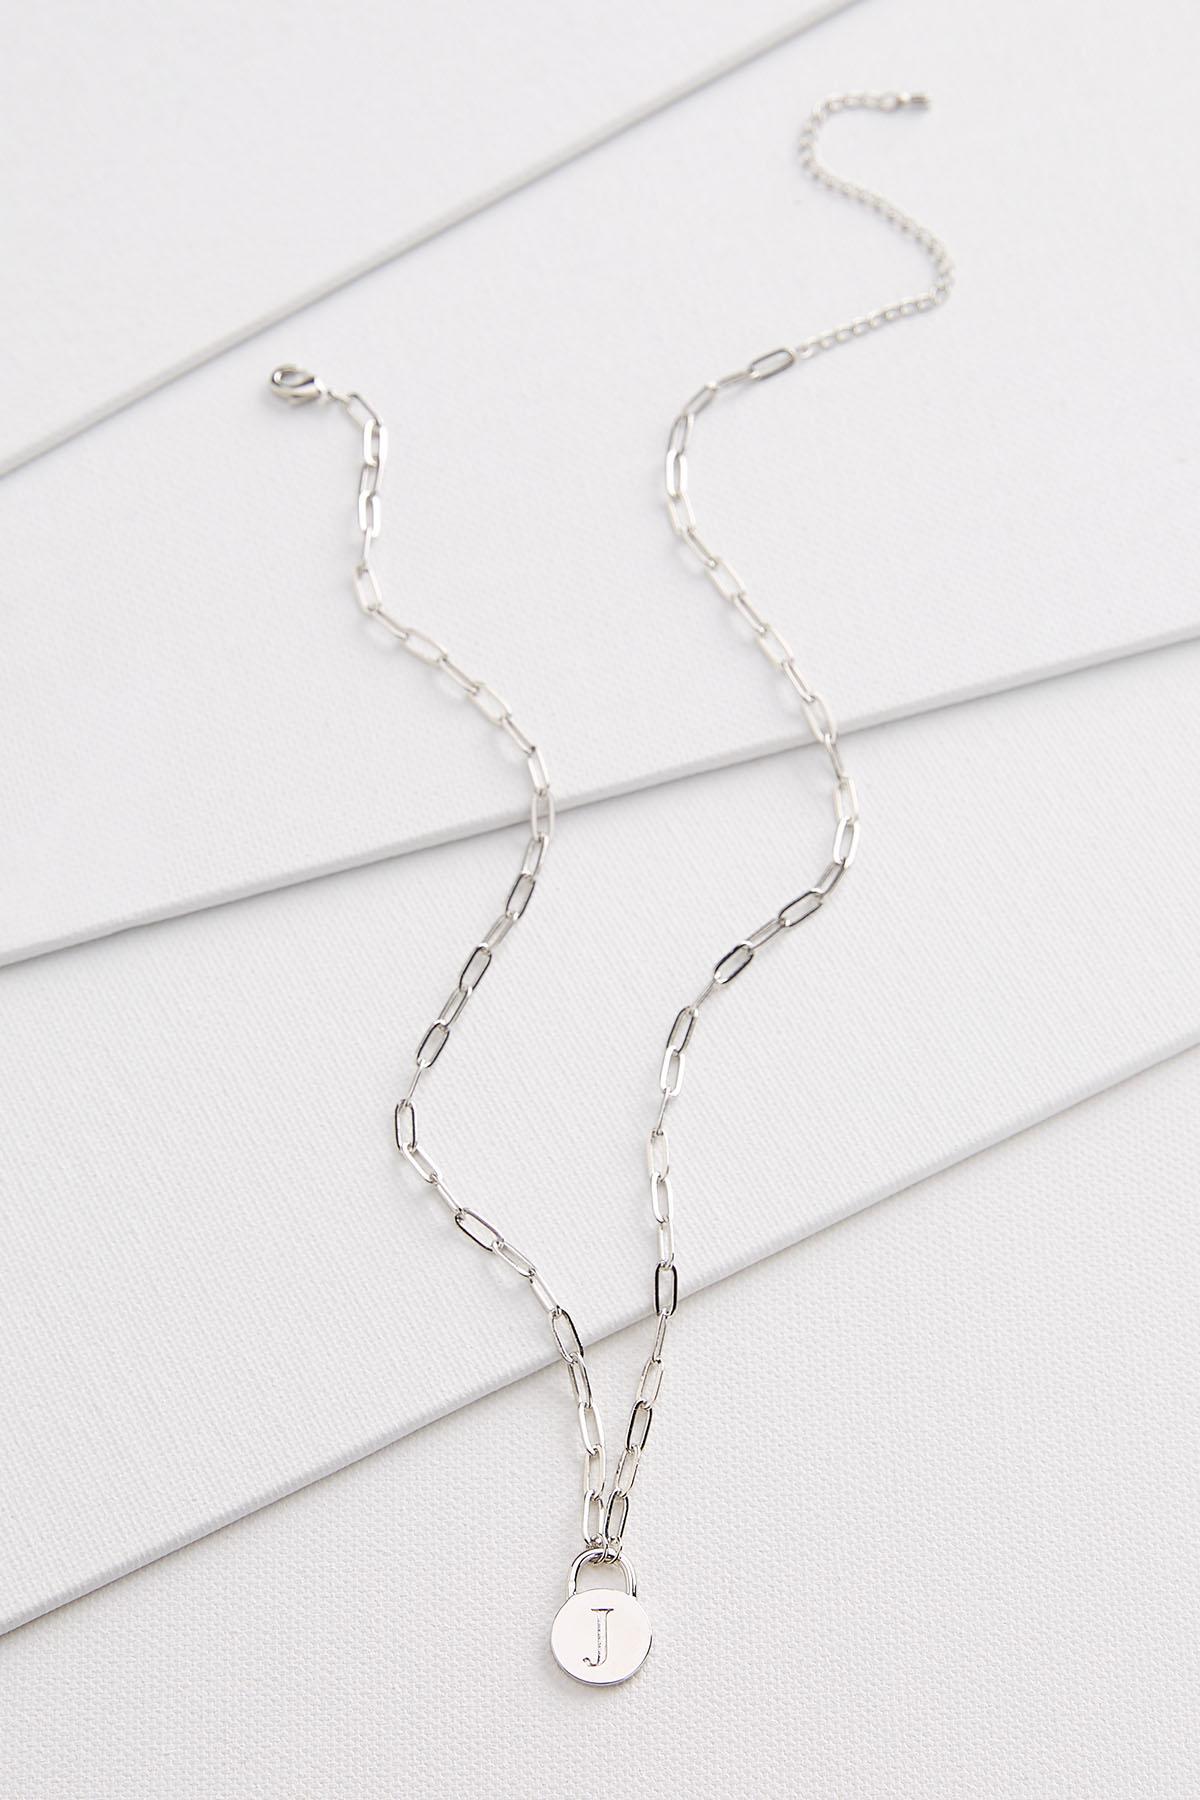 Silver J Necklace